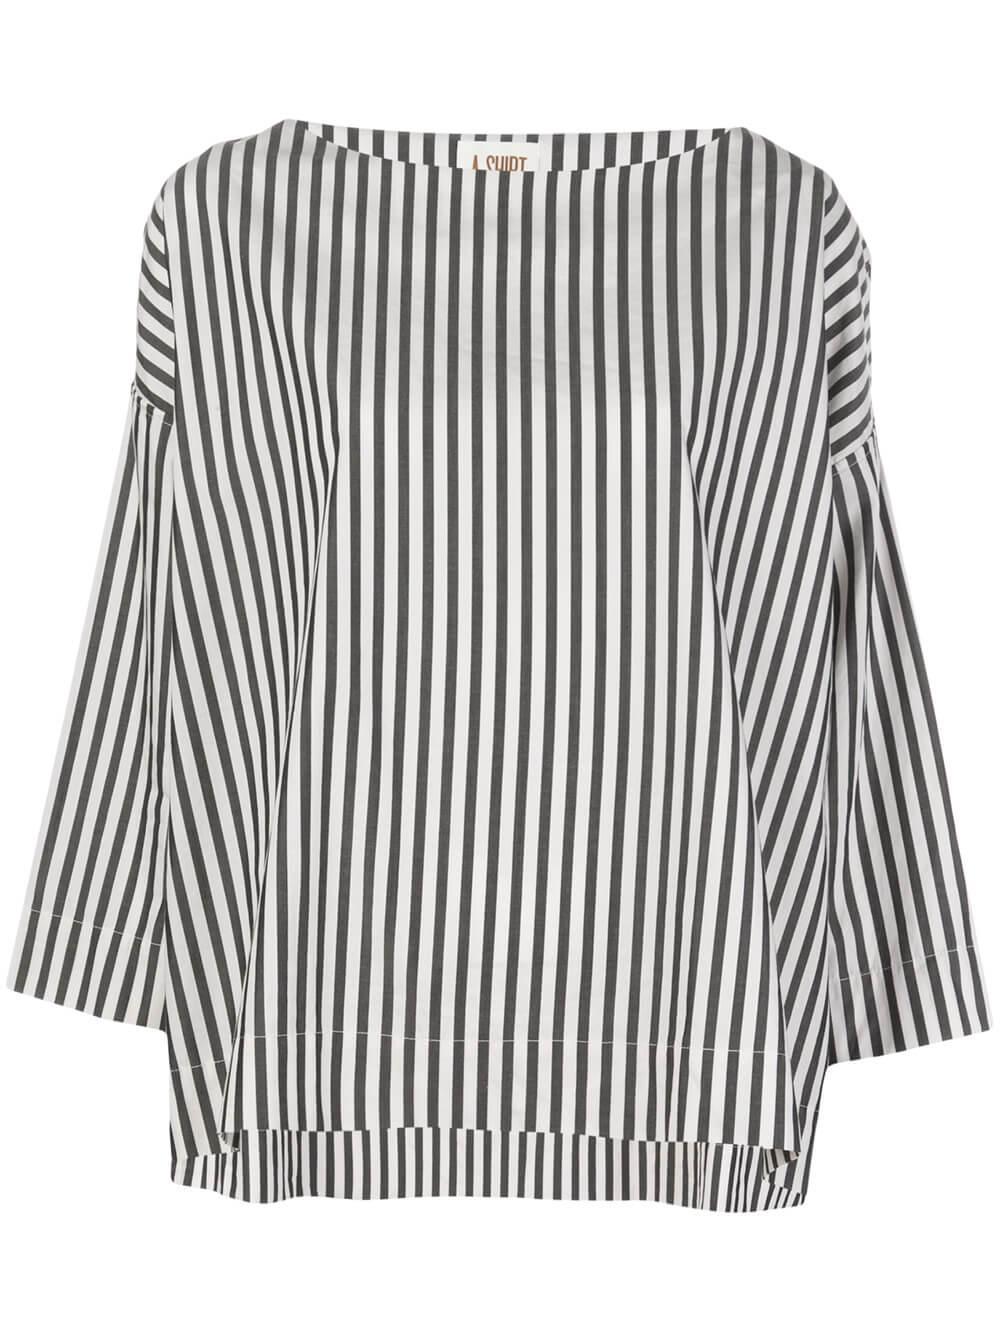 Nilou Stripe Crew Neck Shirt